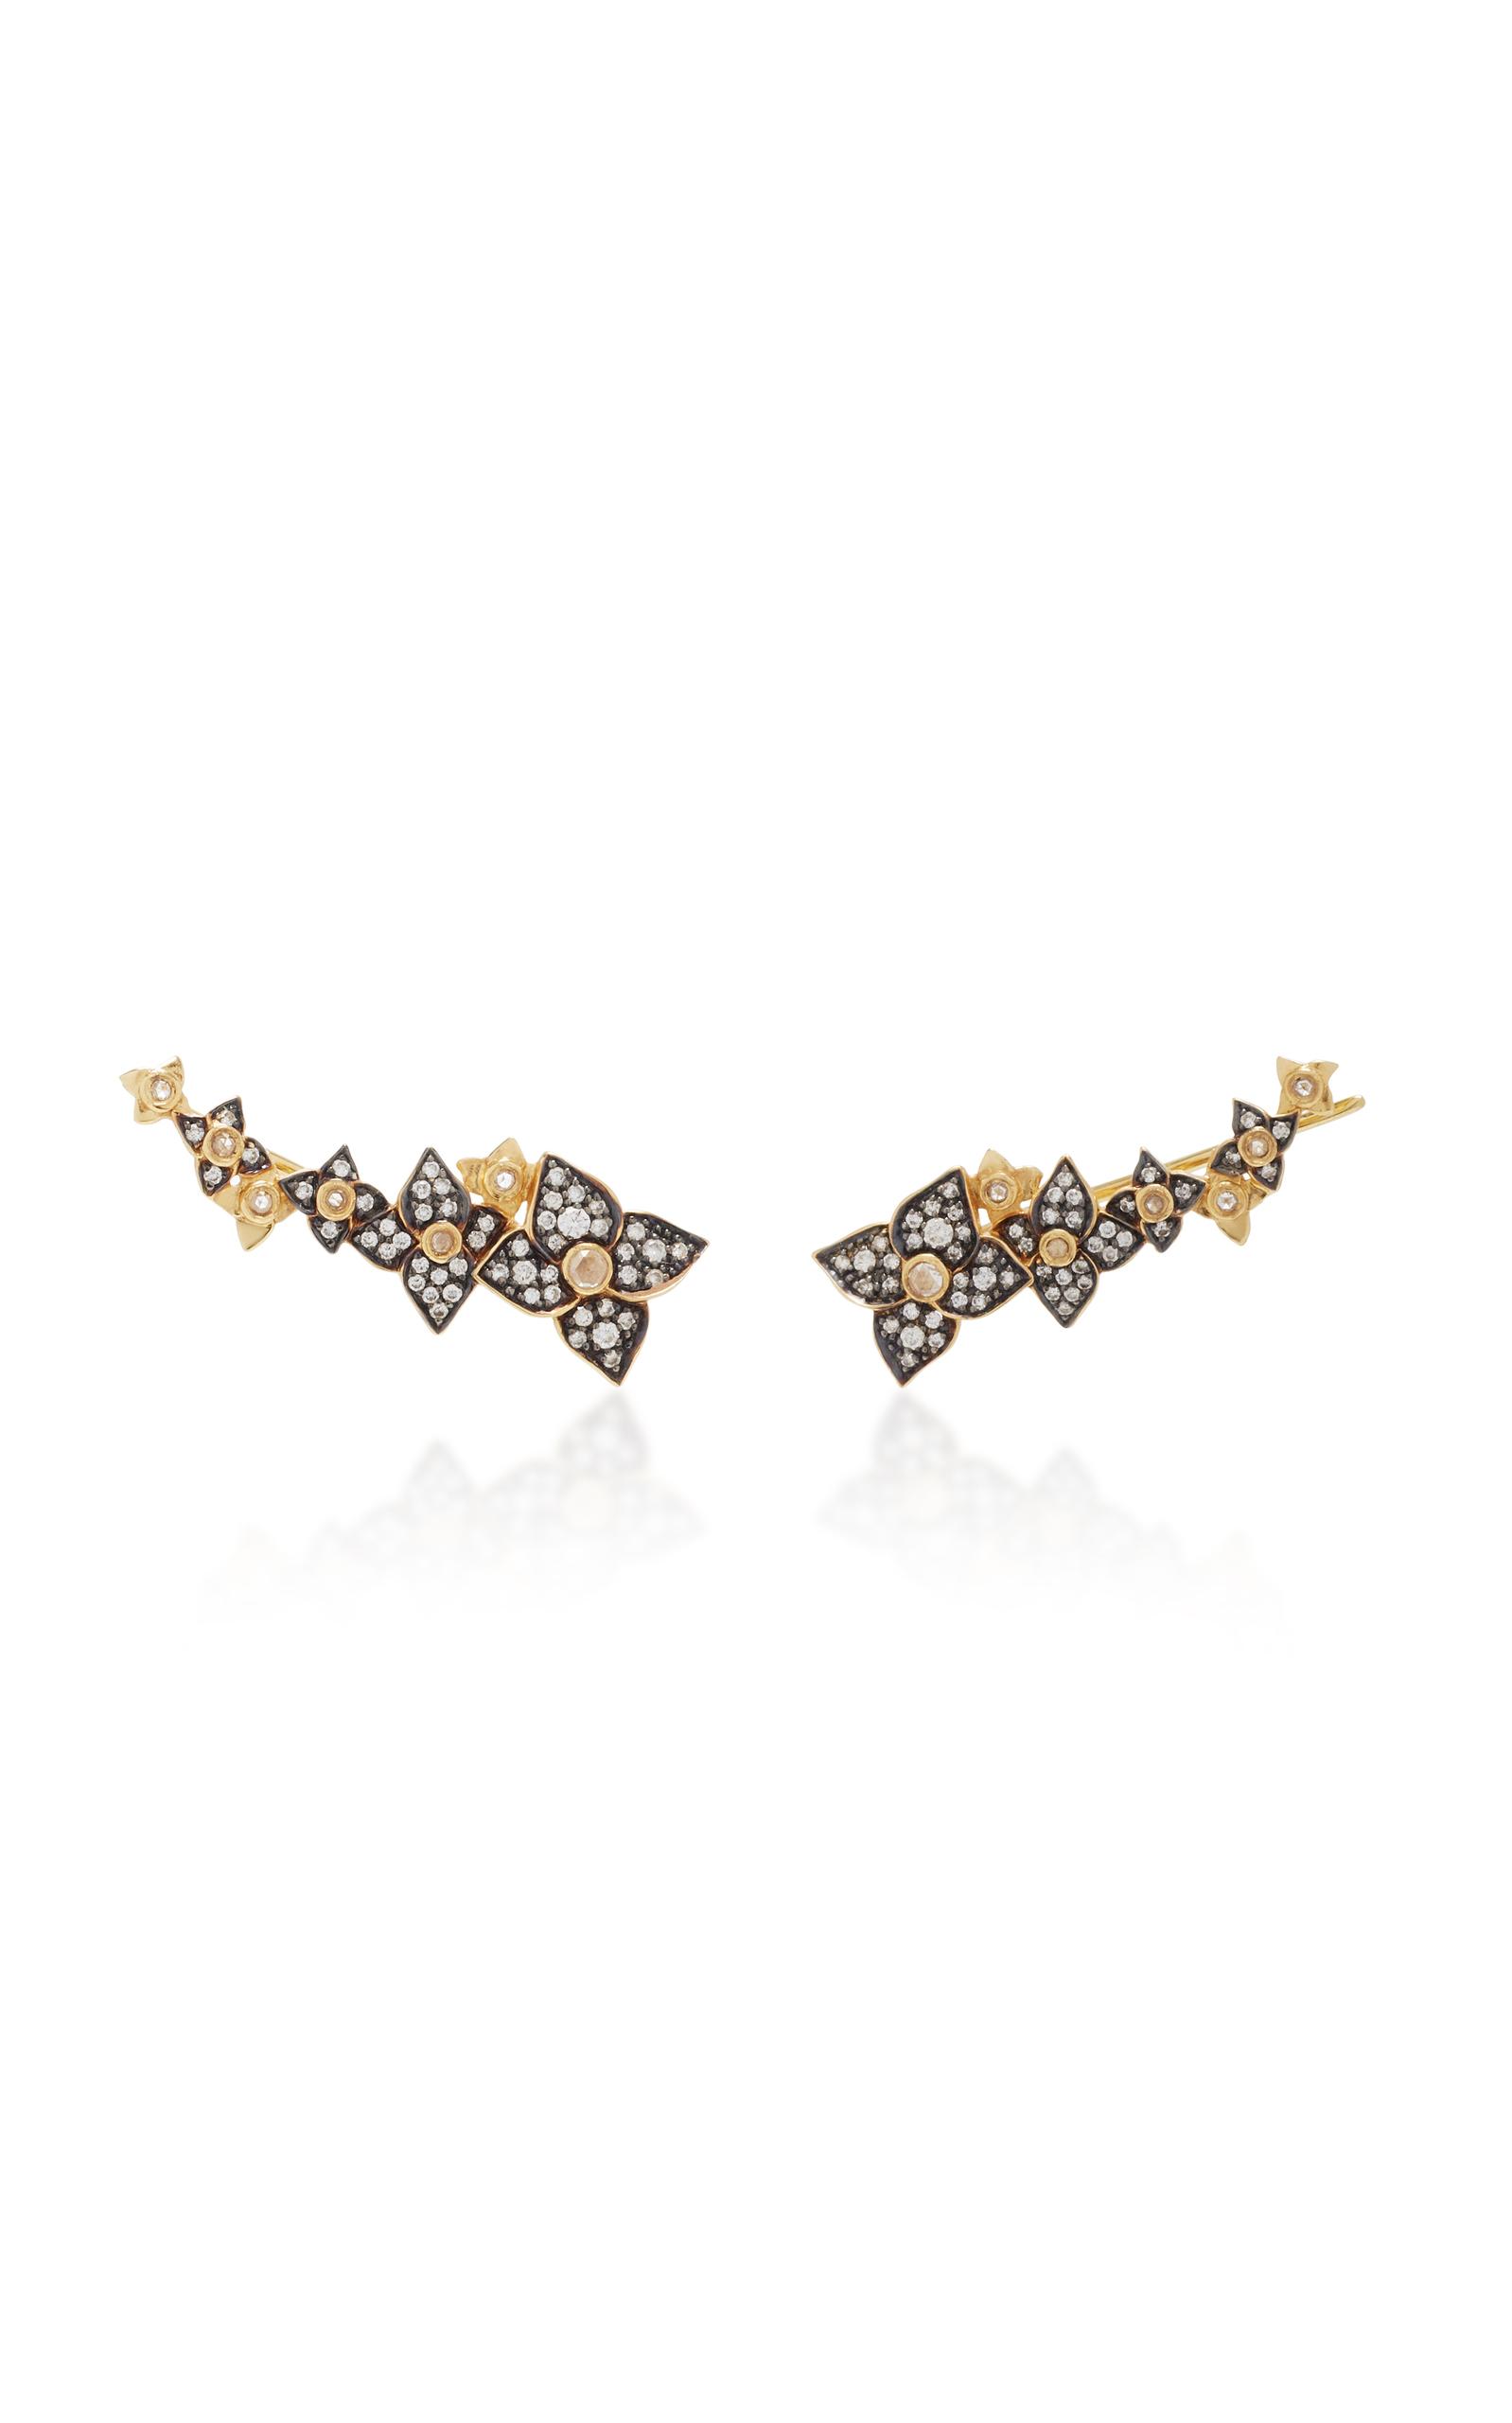 18K Gold Double Hoop Diamond Earrings Sorellina POSzgkRLGx